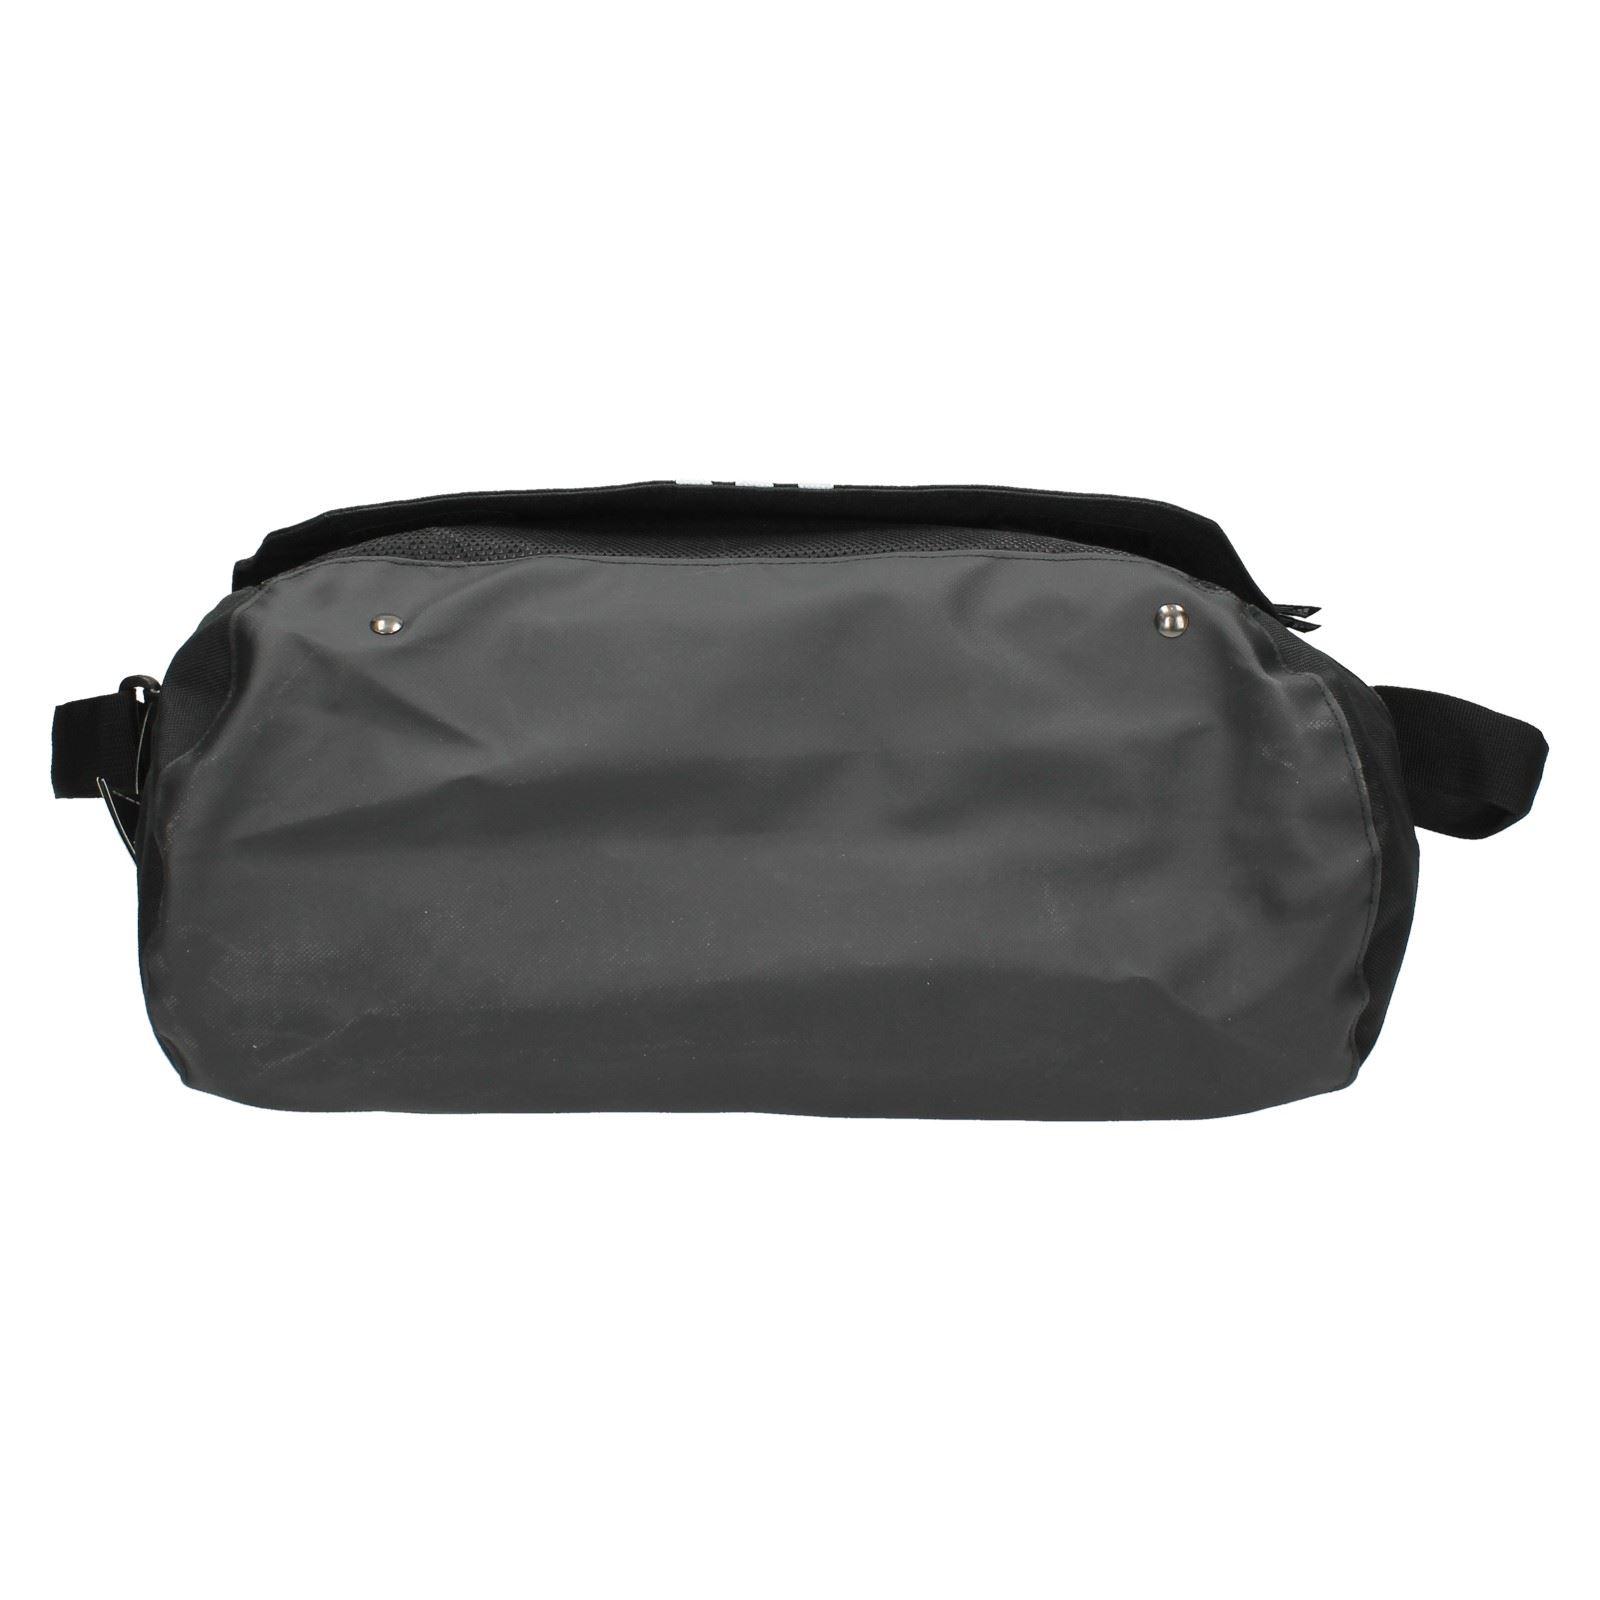 Mens Adidas Sporty Shoulder Bag V86891 | eBay